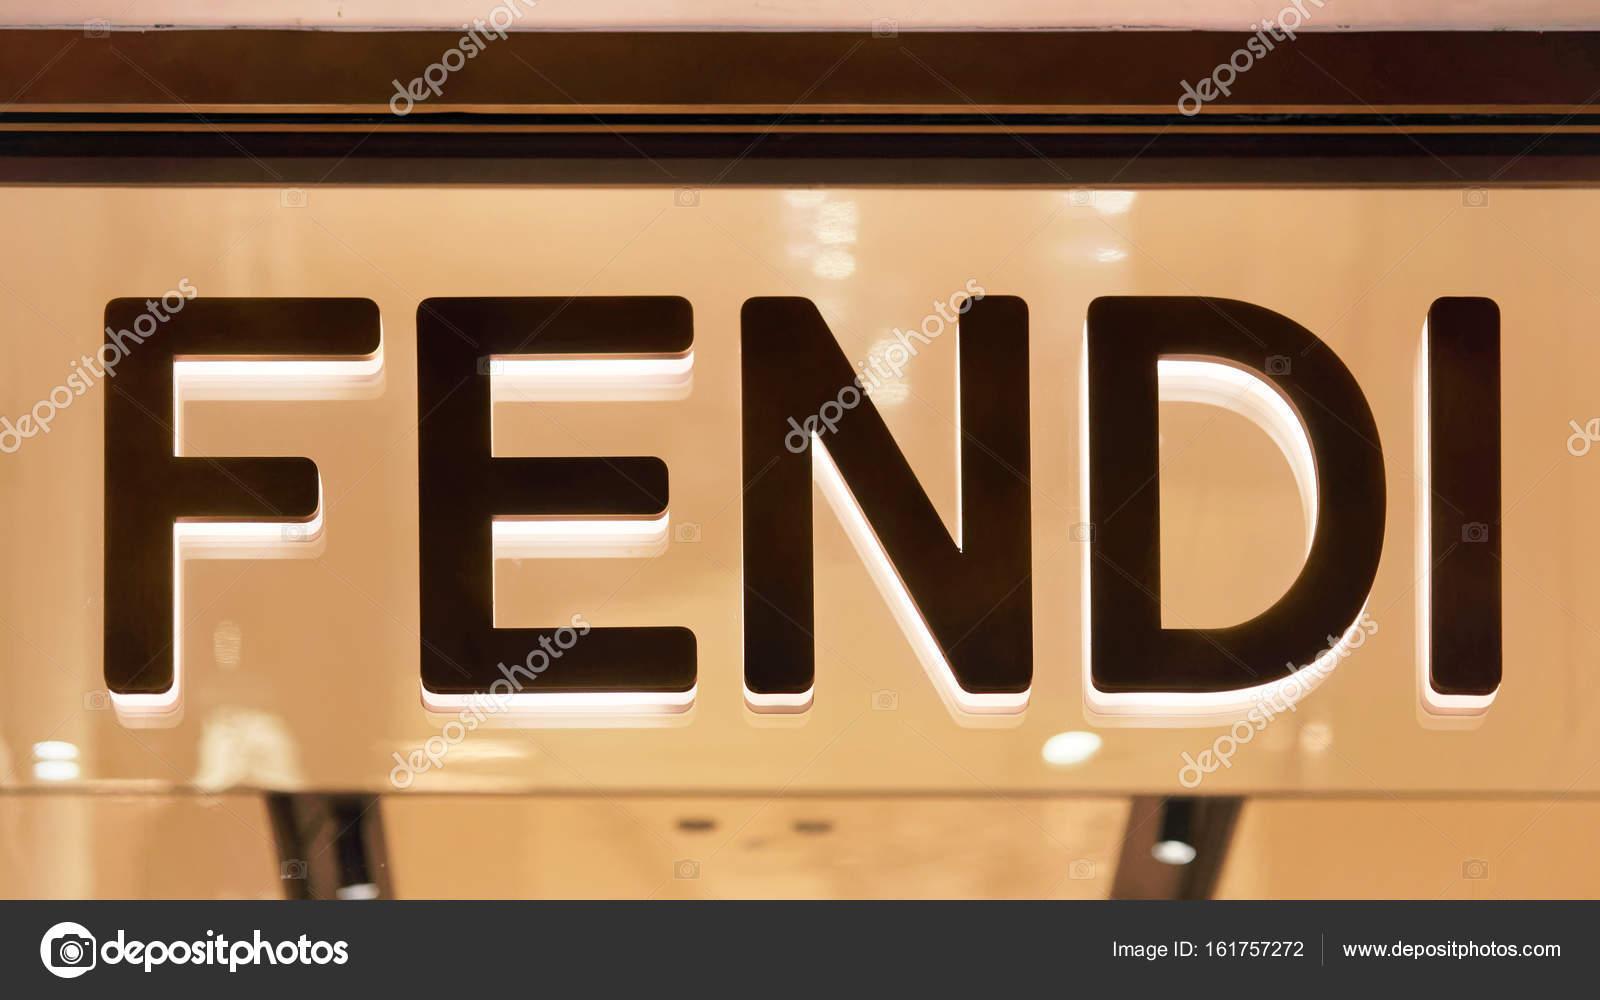 Rome, Italie - 14 octobre 2016   Fendi signe sur vitrine rue de Rome, Italie  — Image de erix2005 df962fc656d